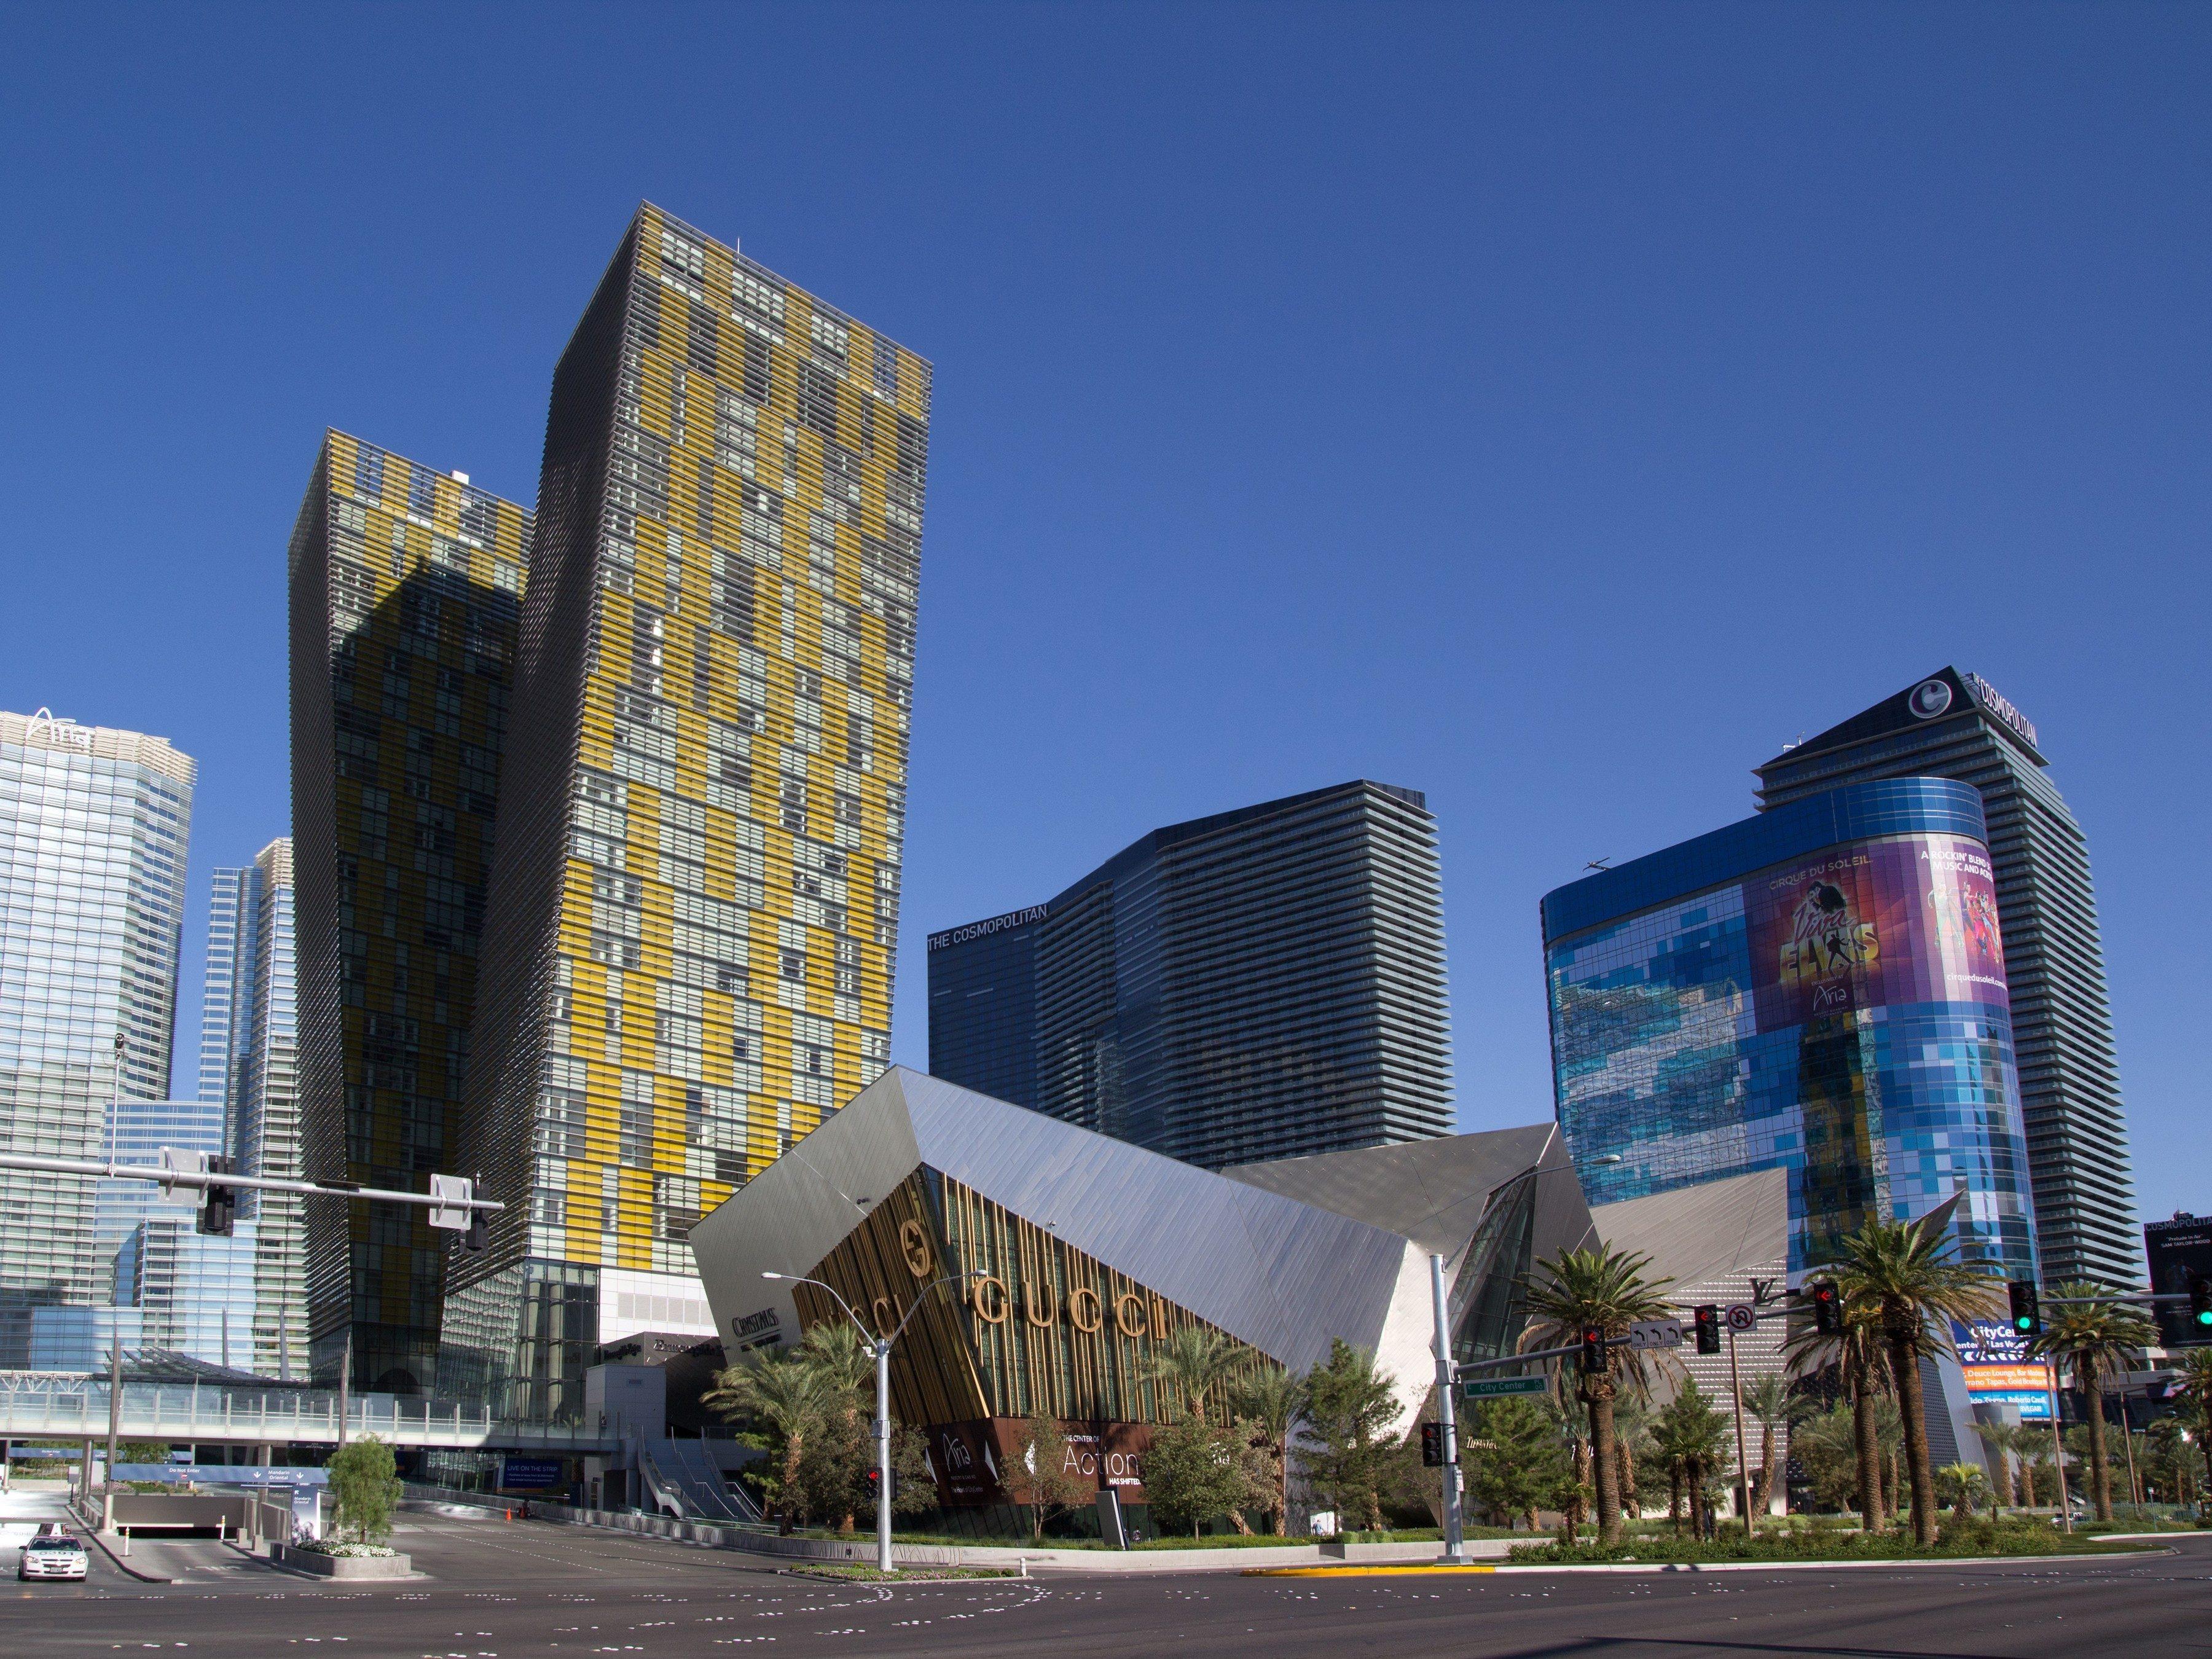 10 Amazing Reasons to Visit Las Vegas: City Center